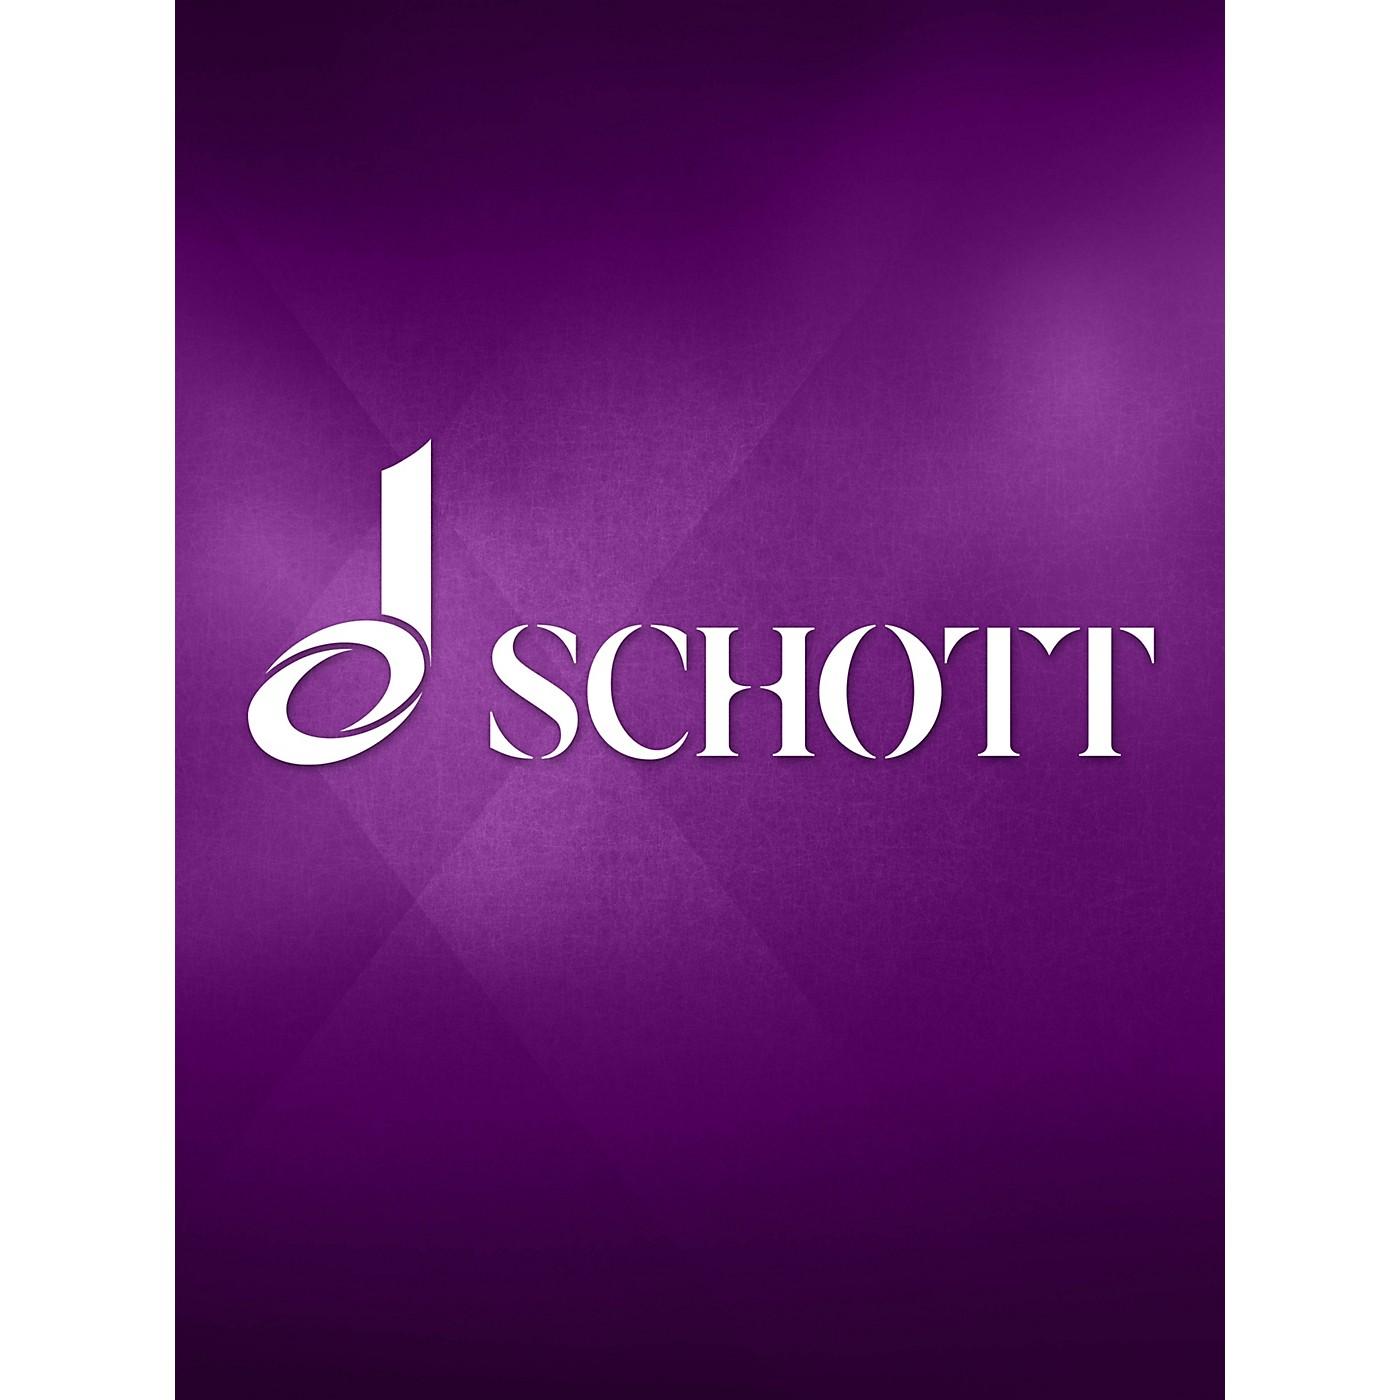 Eulenburg Concerto Grosso in C Major Op. 3, No. 12 (Solo Violin I Part) Schott Series by Francesco Manfredini thumbnail